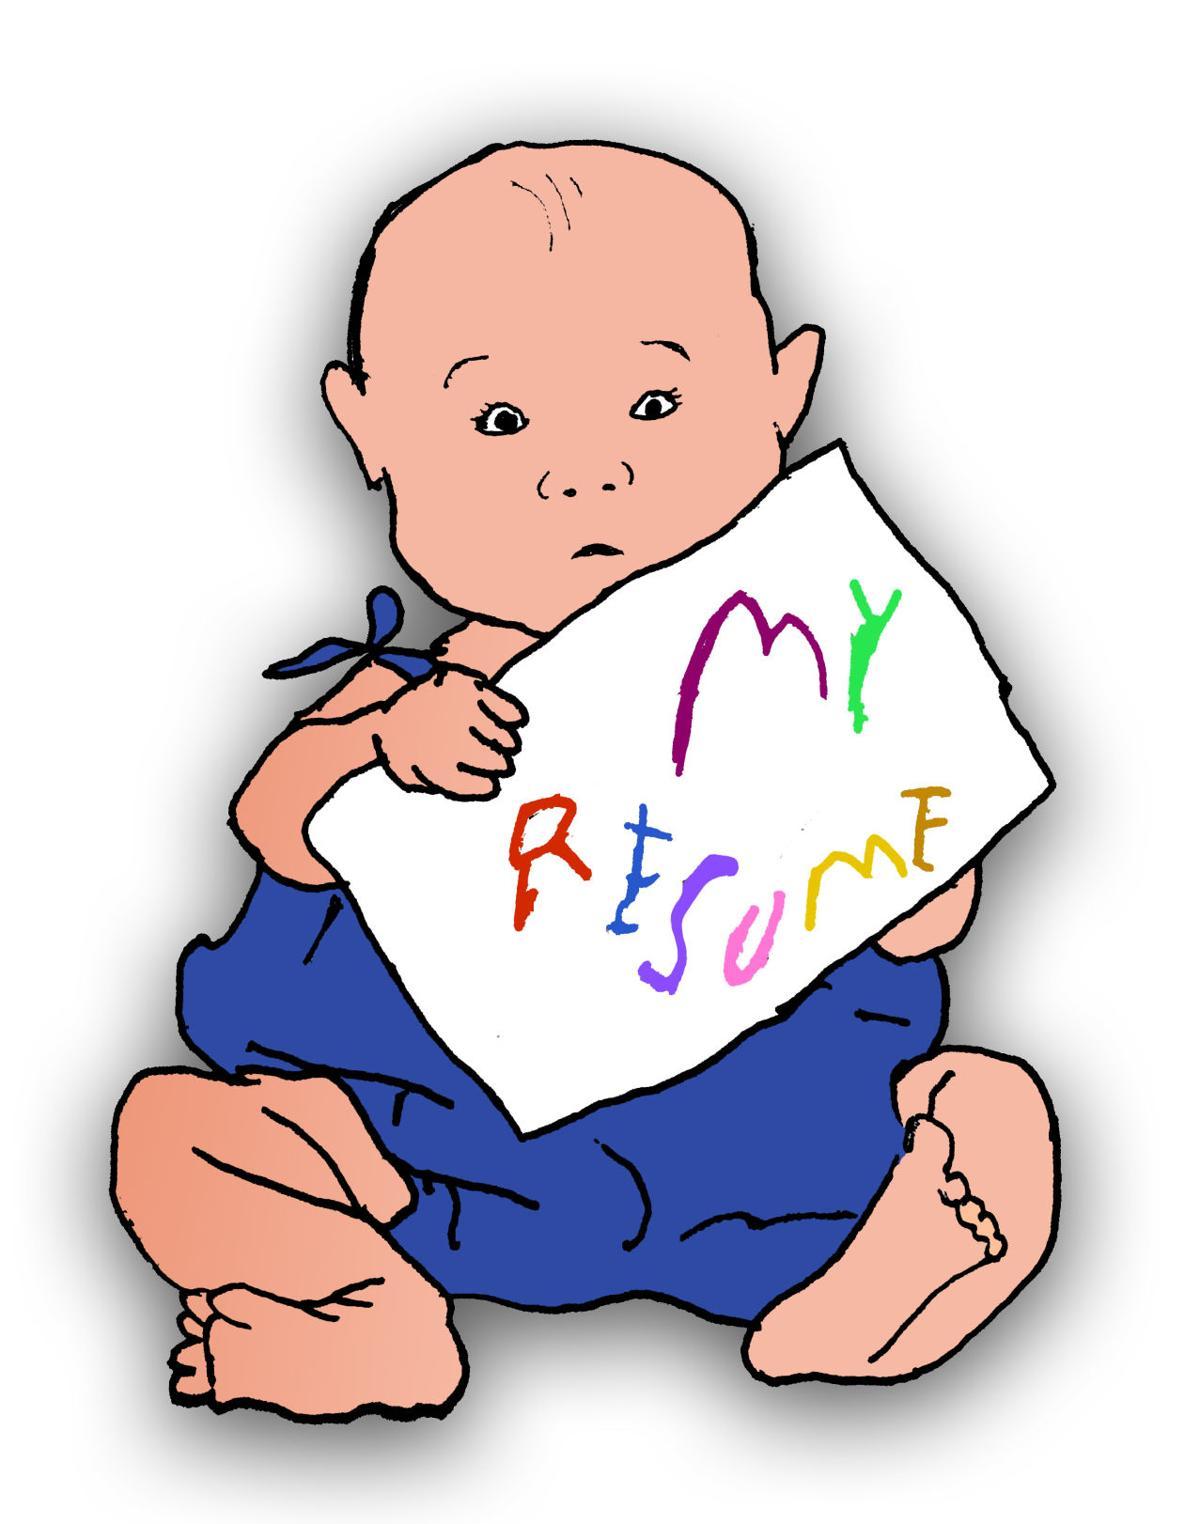 Babysitting clipart child patience. The broken philosophy of